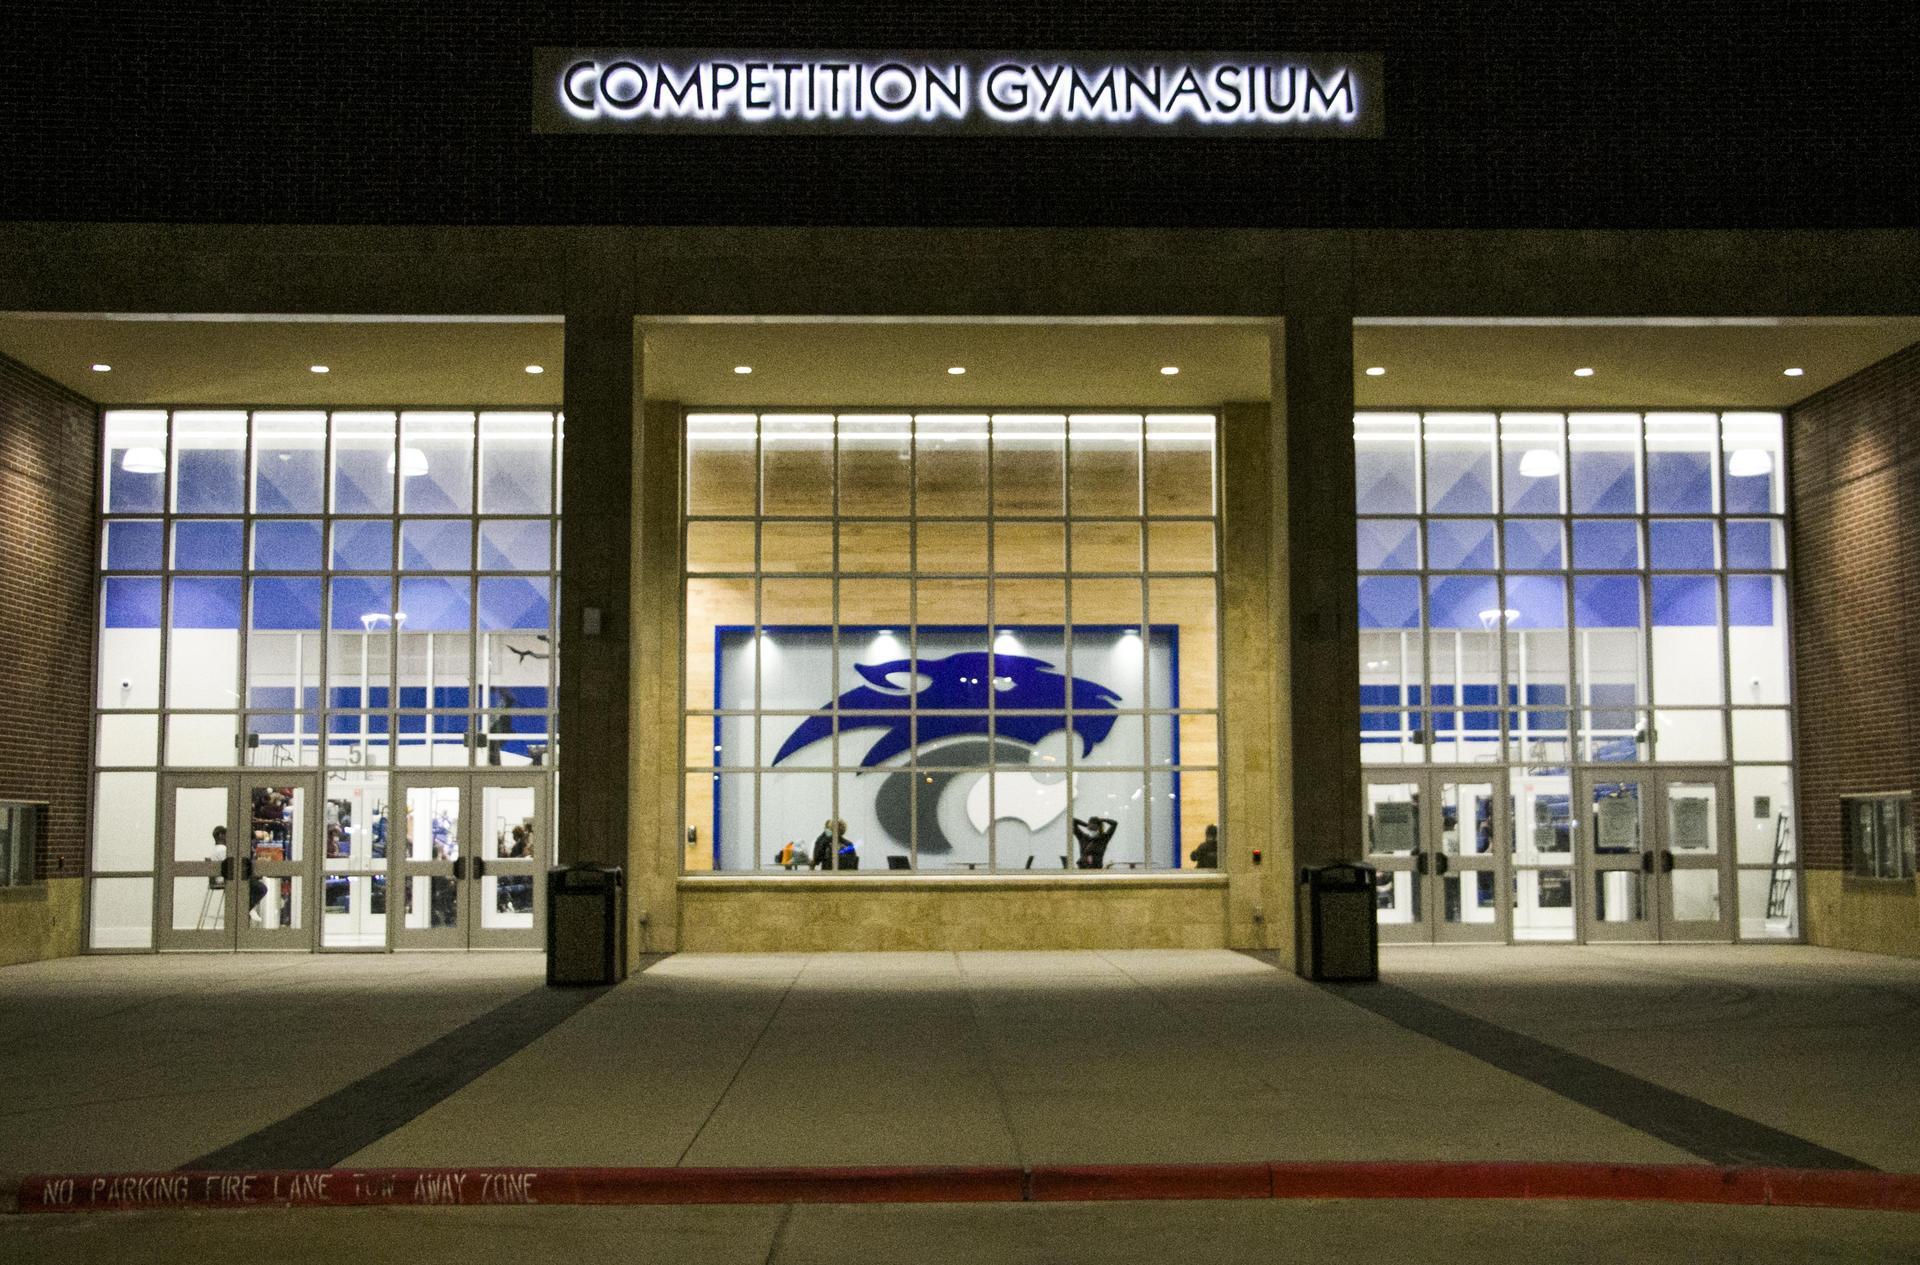 khs_competition_gymnasium